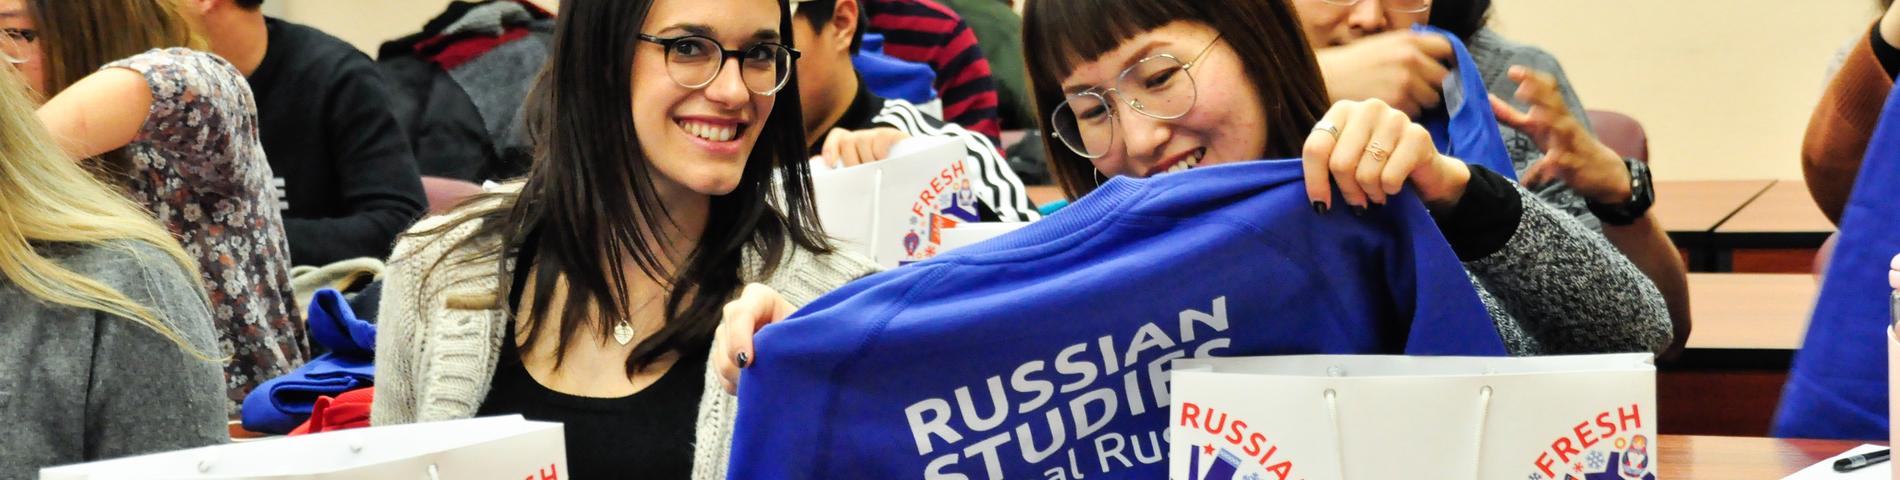 Russian Studies in Real Russia kép 1